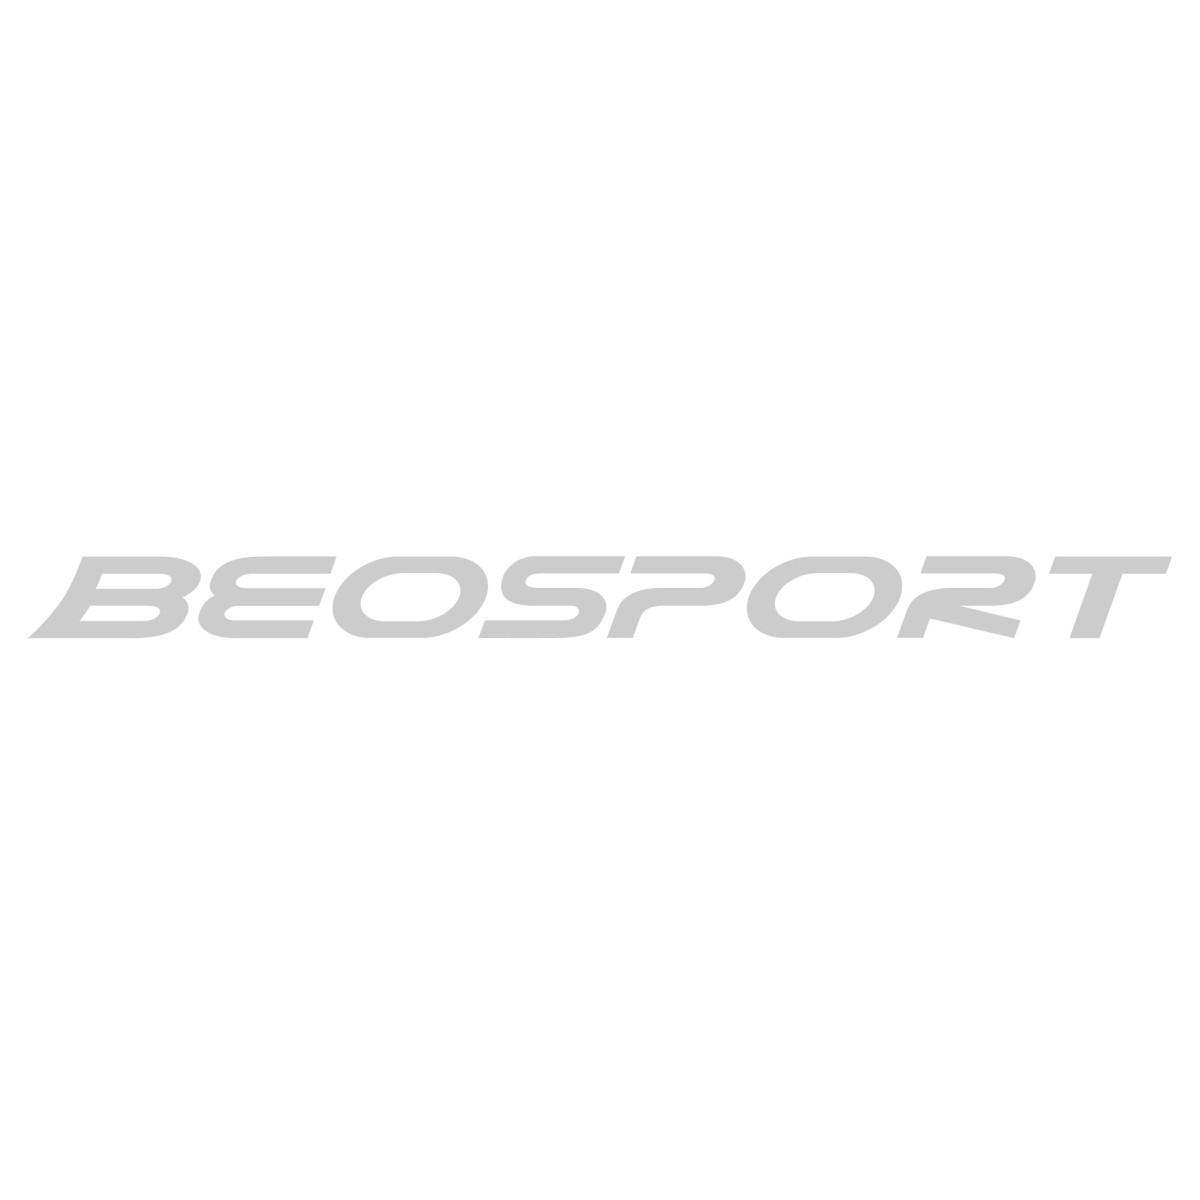 Wilson Avp Aztec lopta za odbojku